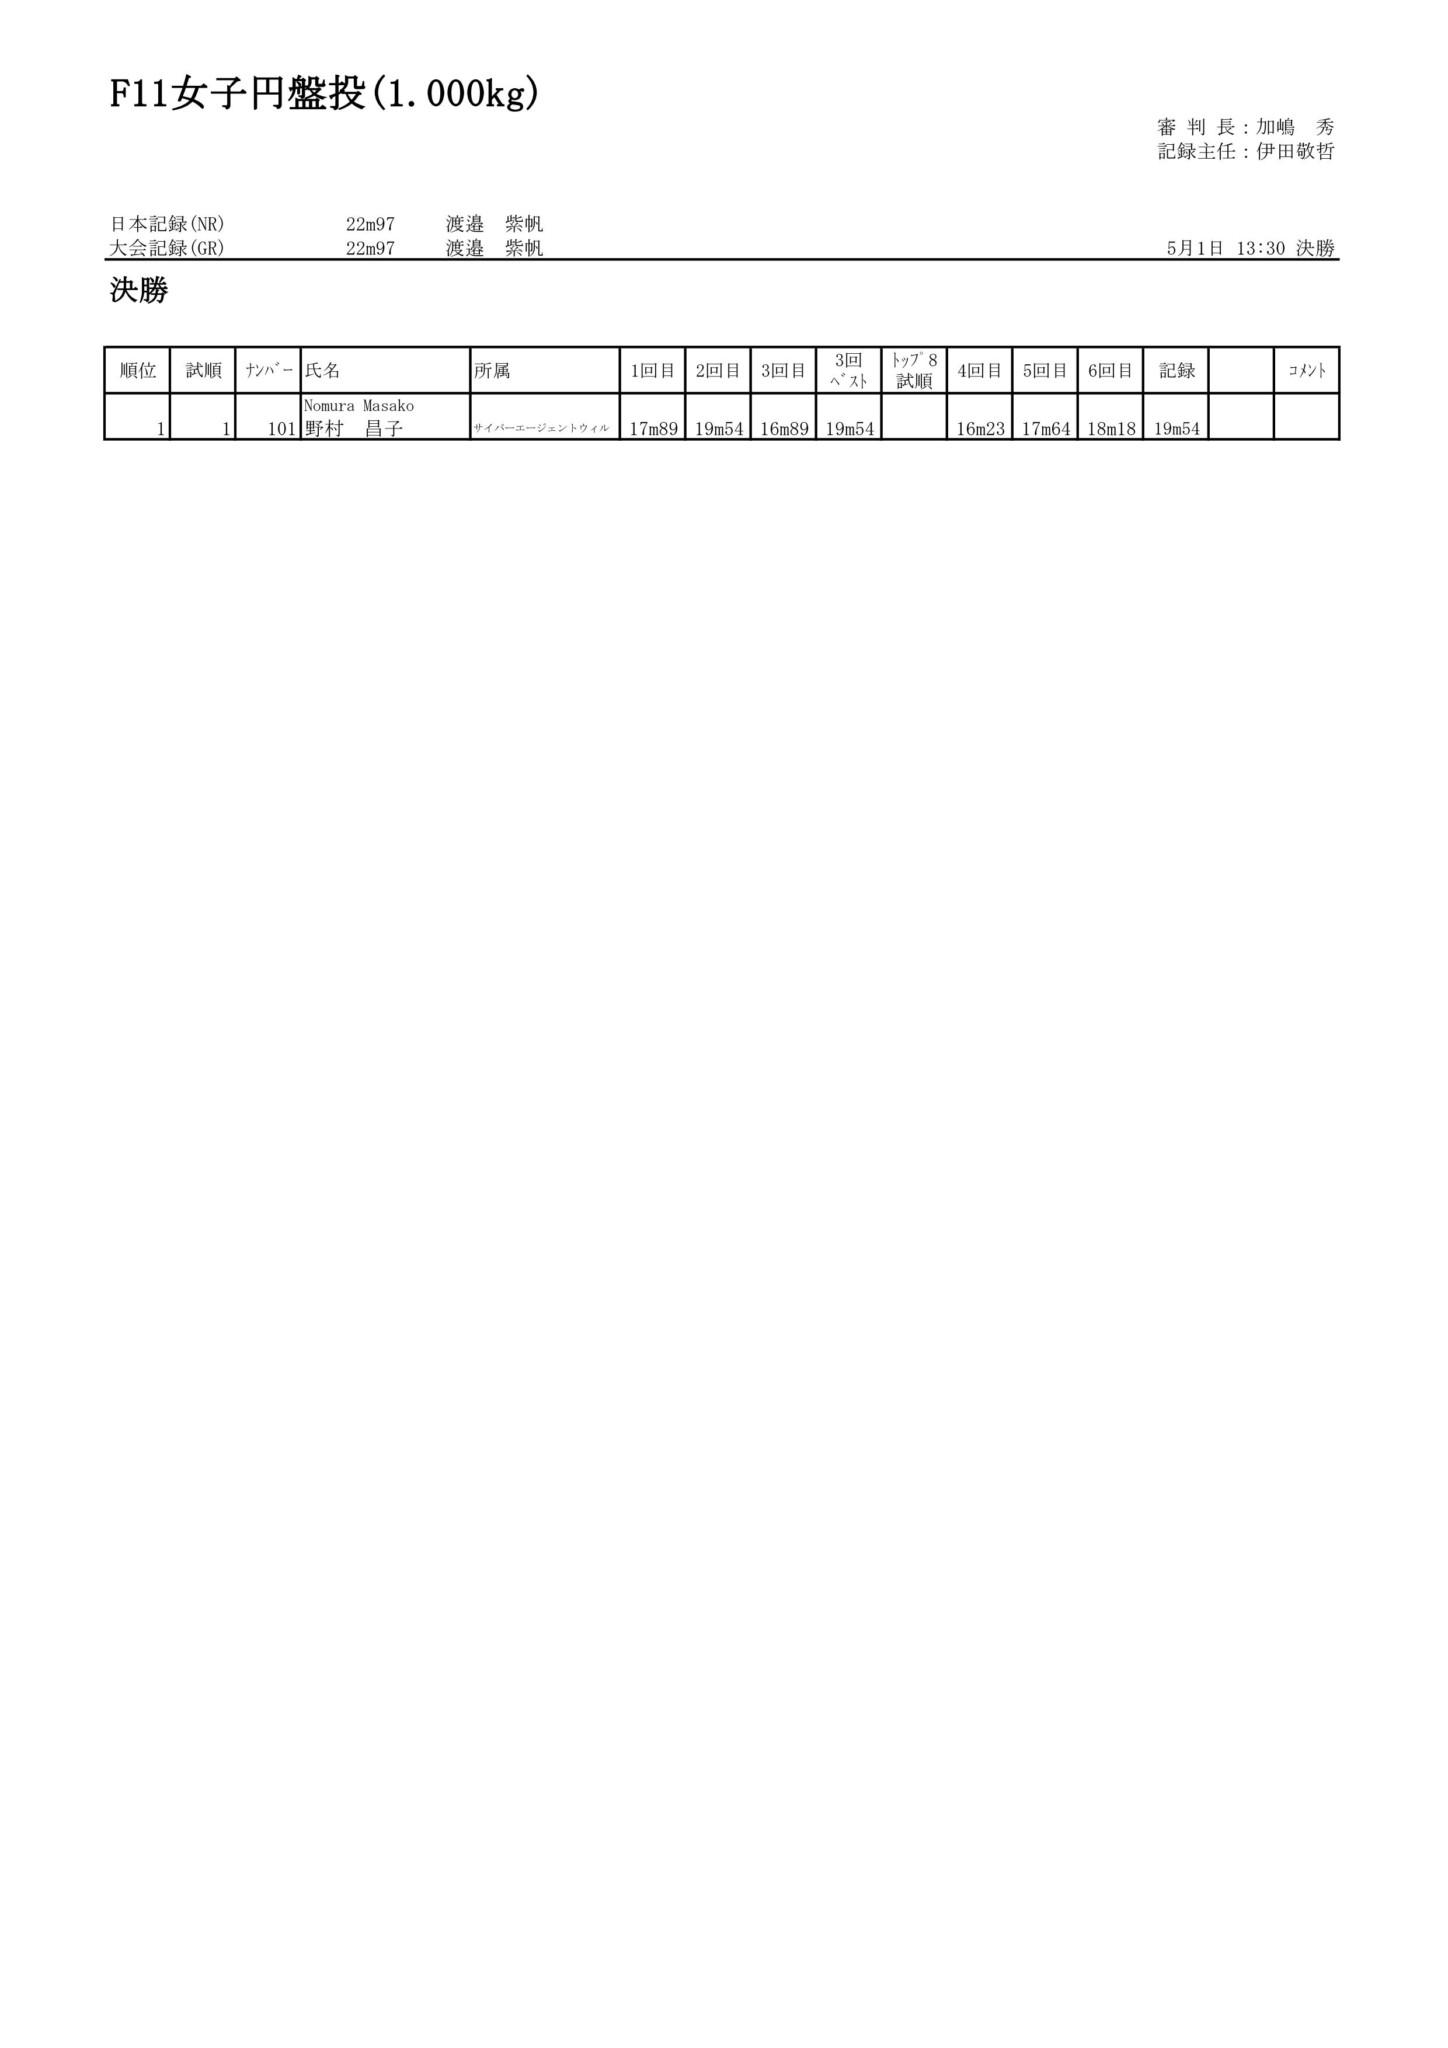 61F11女子円盤投(1.000kg)_01